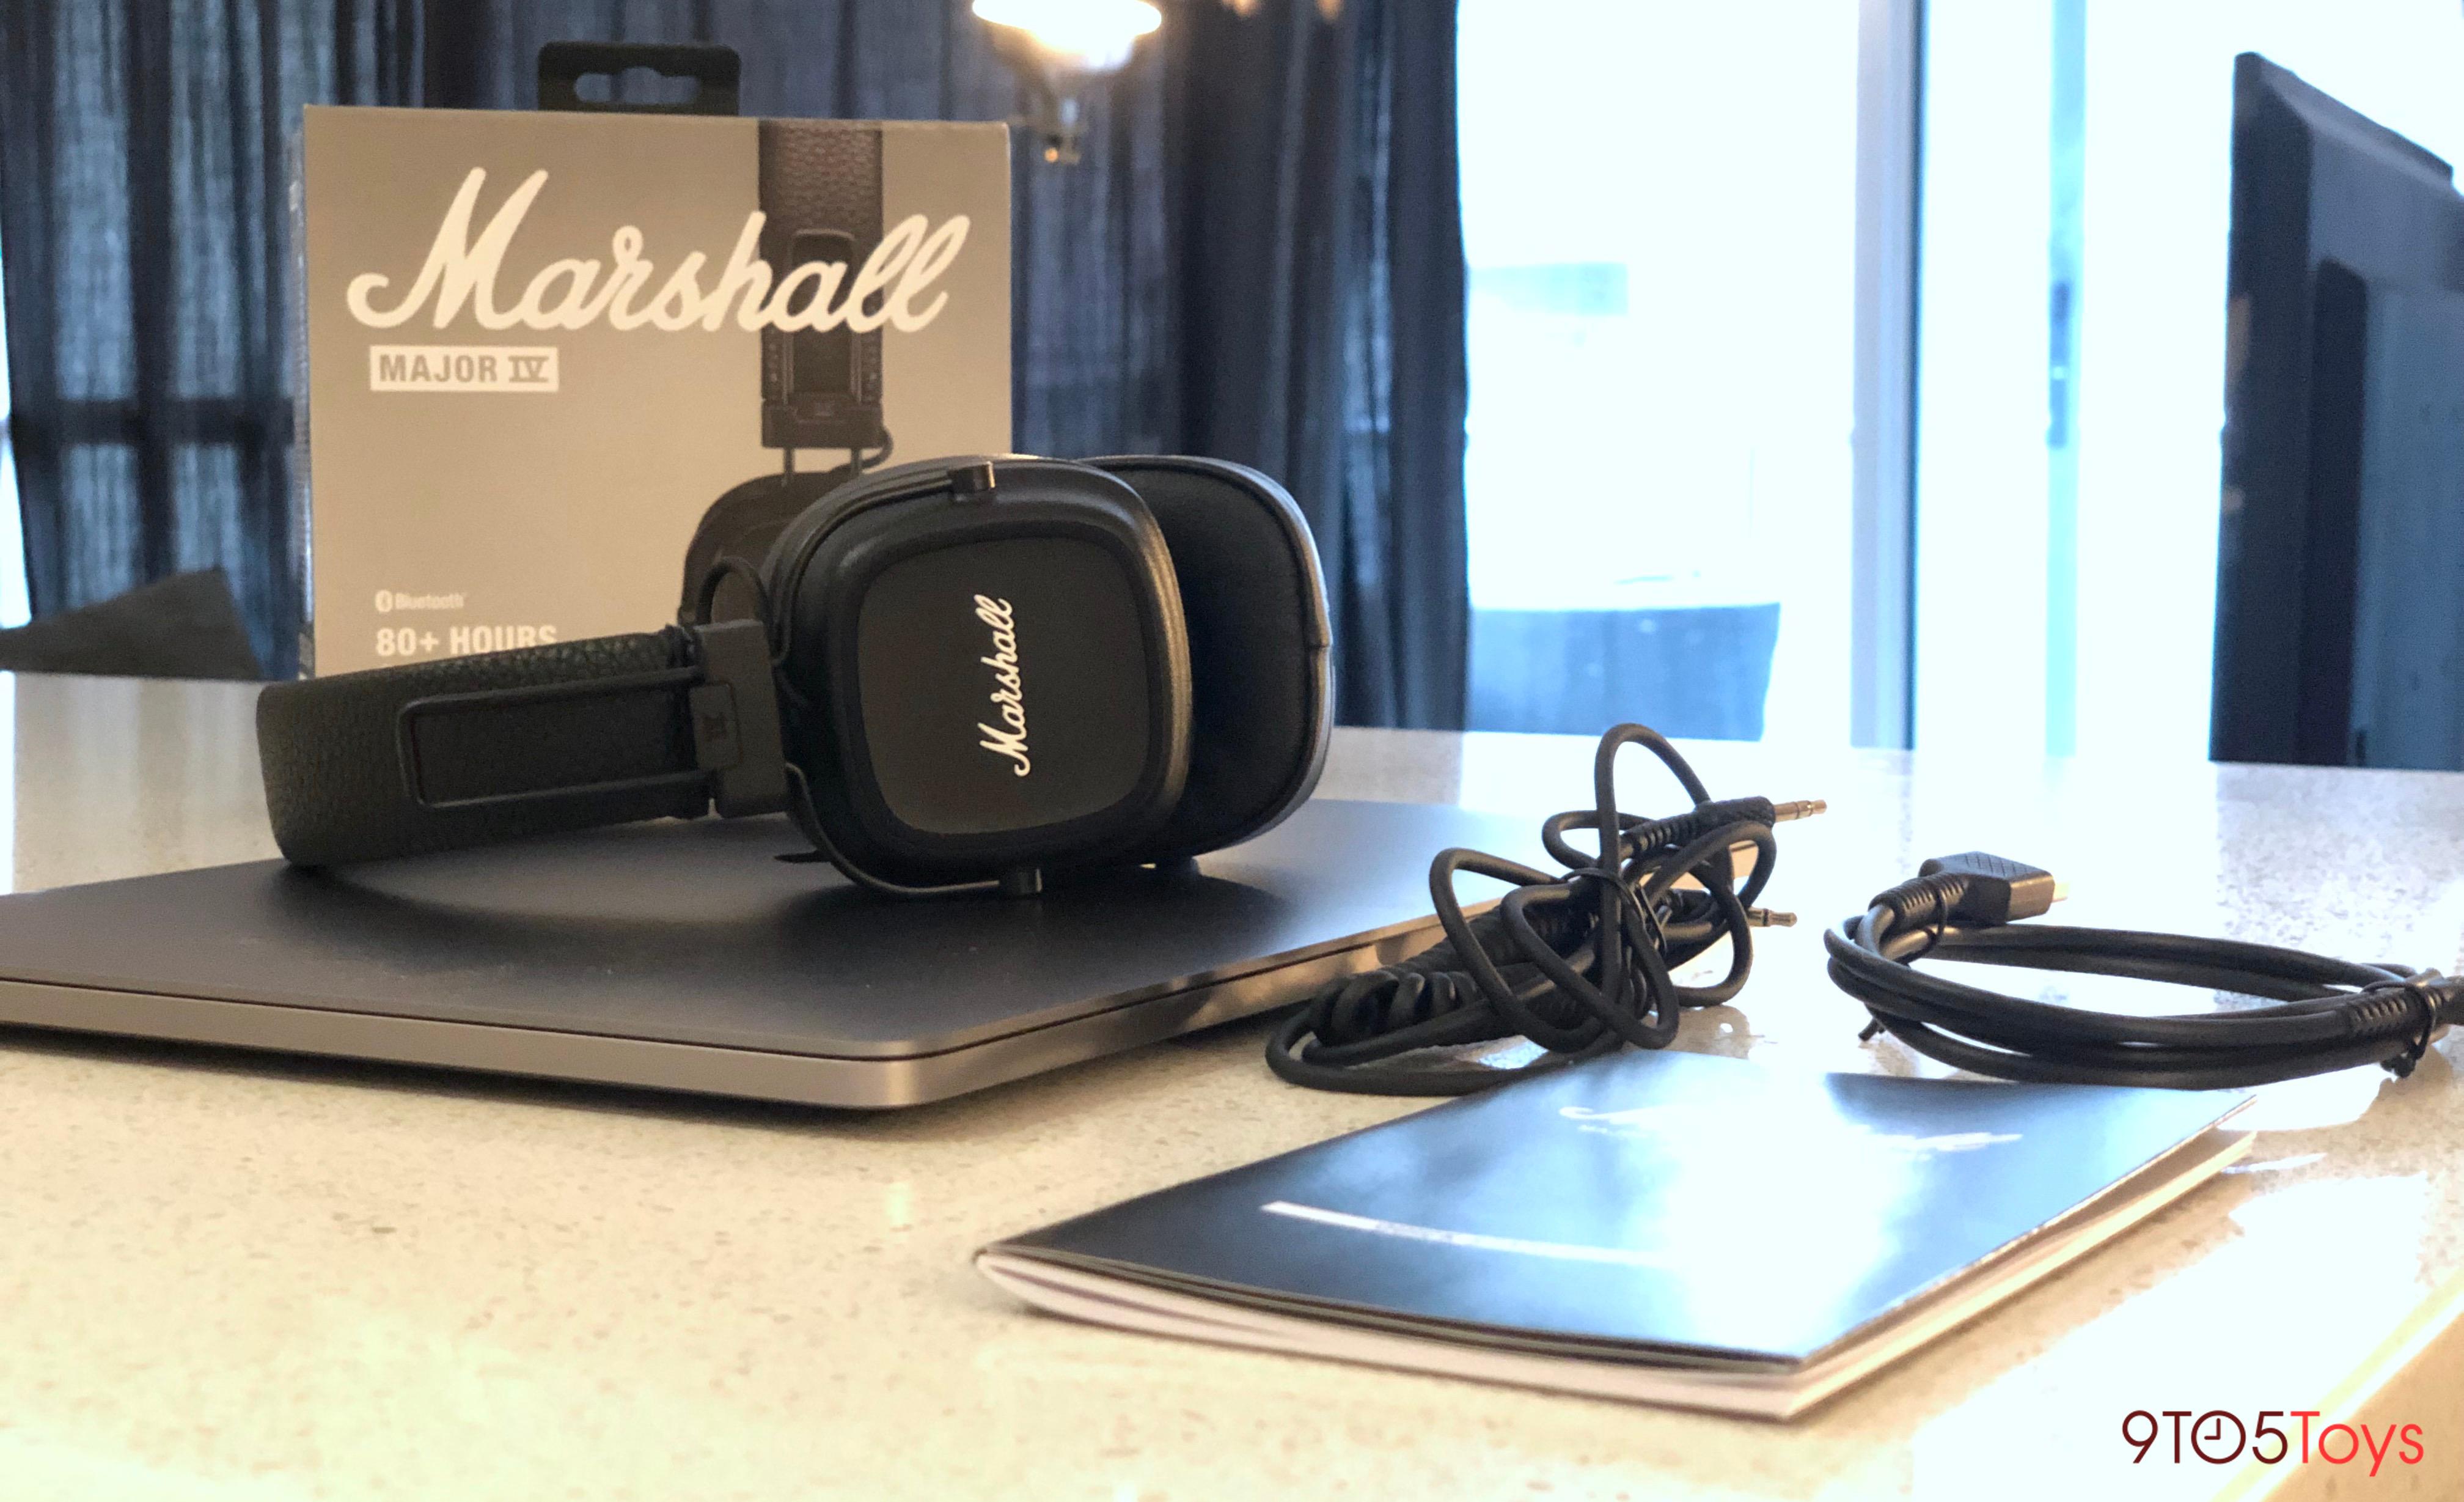 Marshal Major IV Headphones Wireless charging, pairing, more